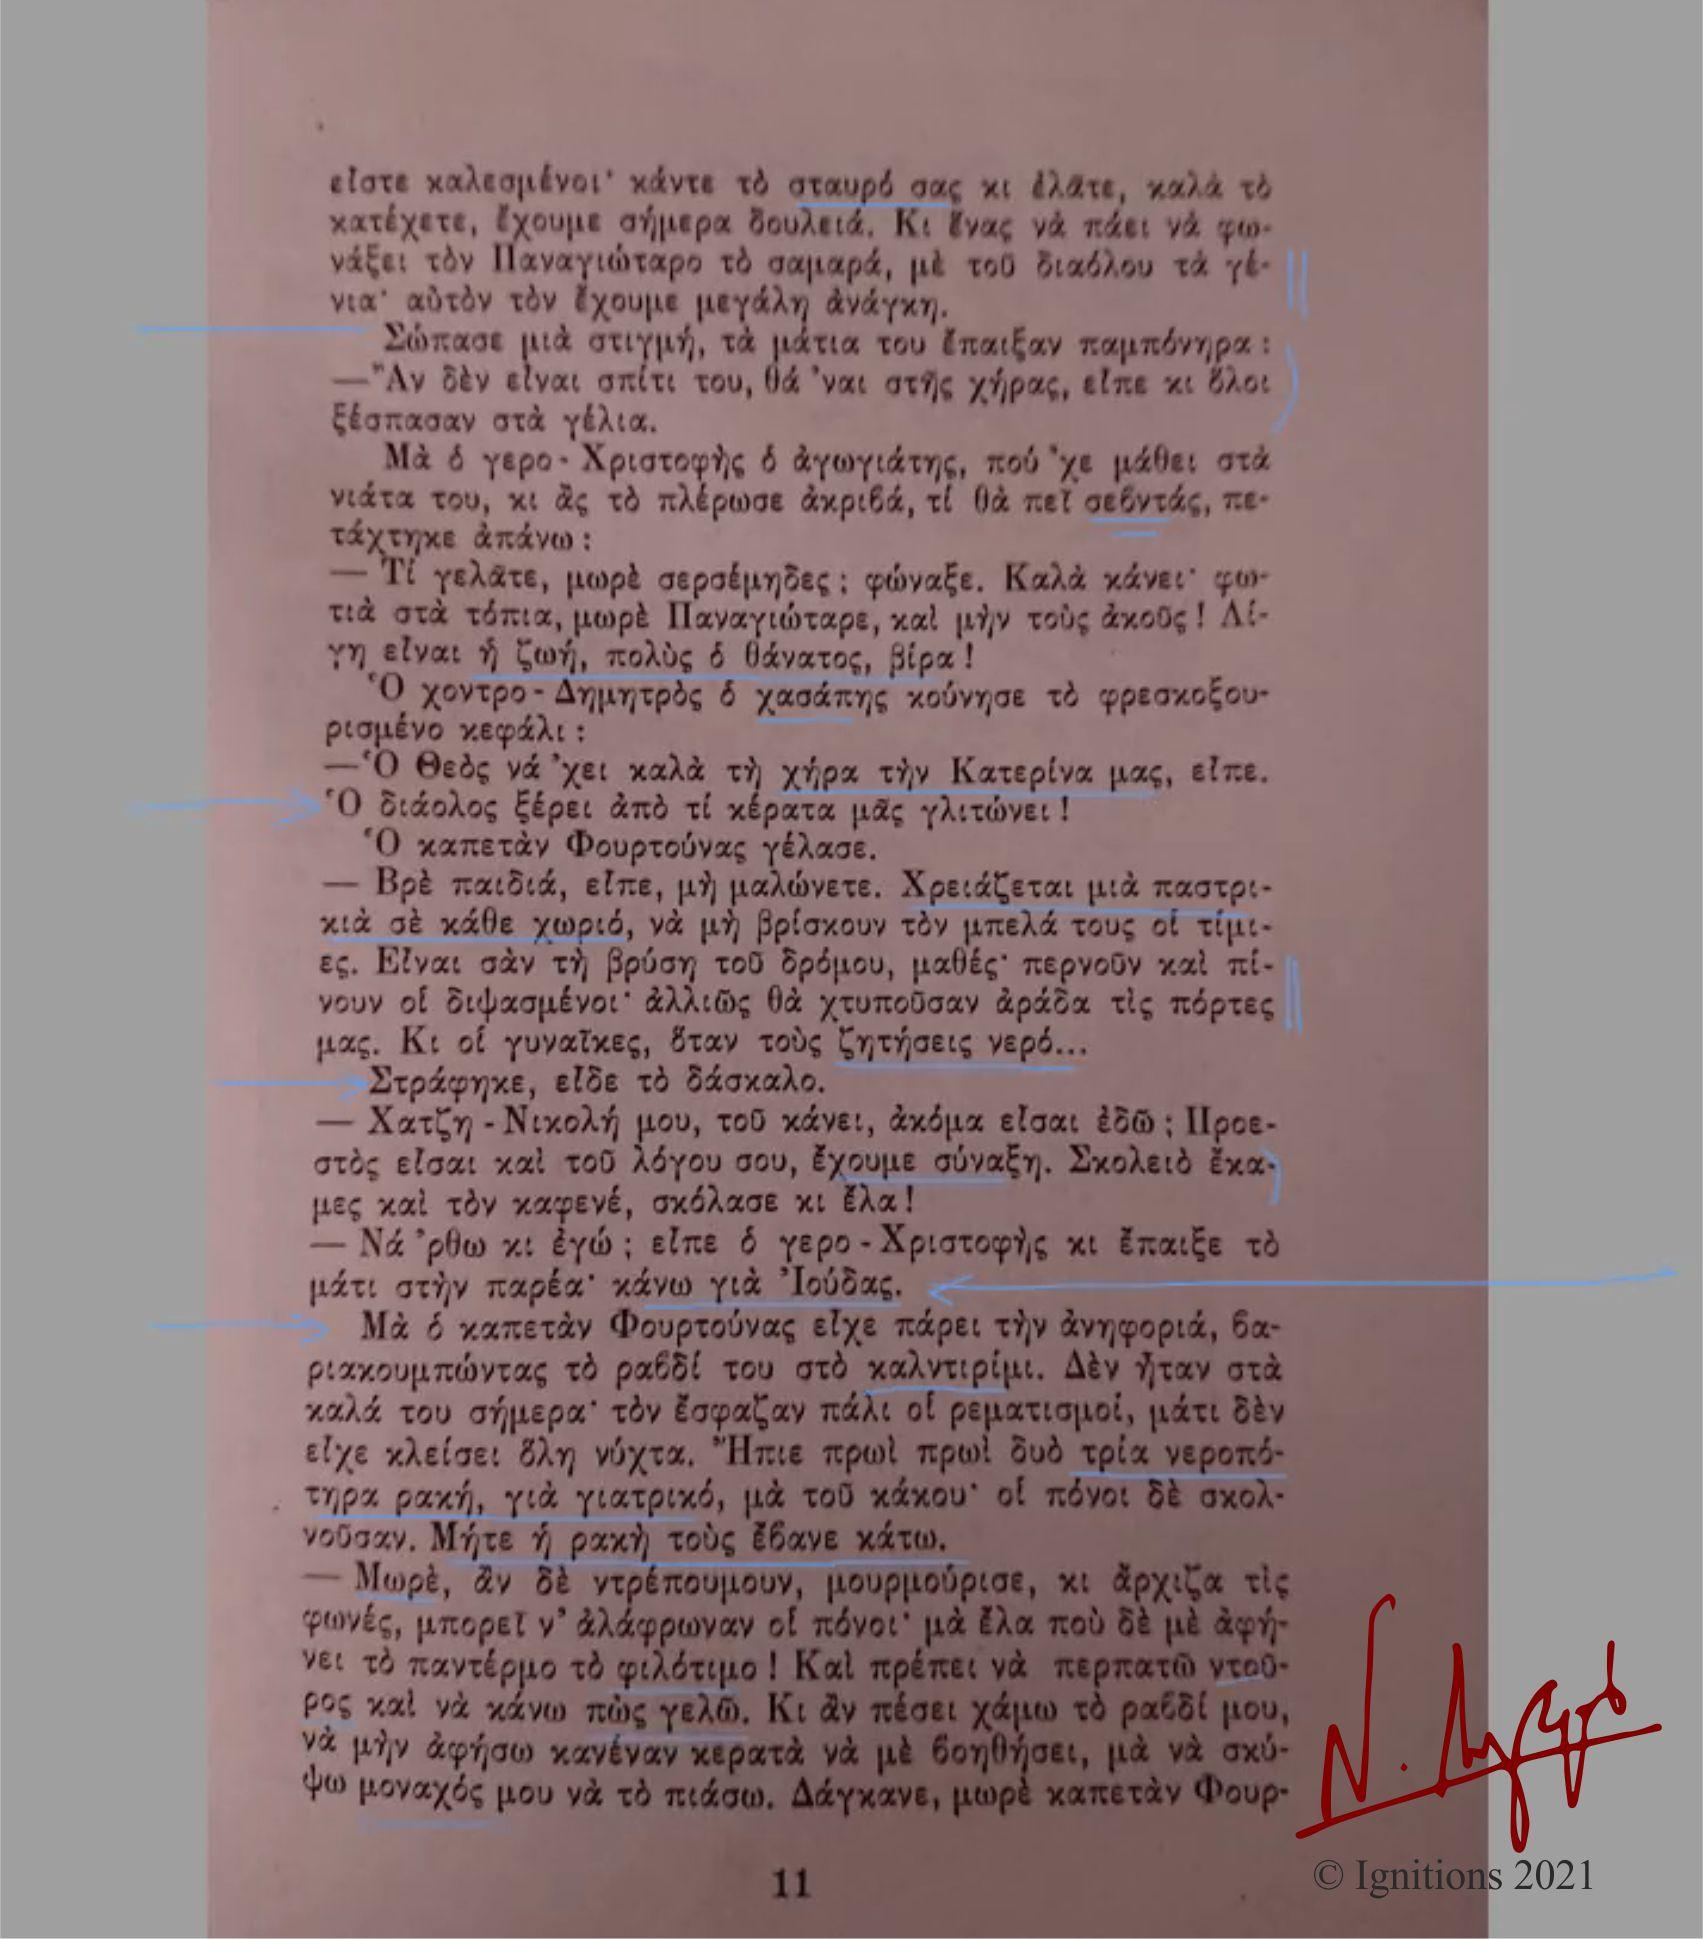 60106 - VI - Η συνέχεια της Σταύρωσης του Χριστού. Συνέχεια IX. (Dessin)